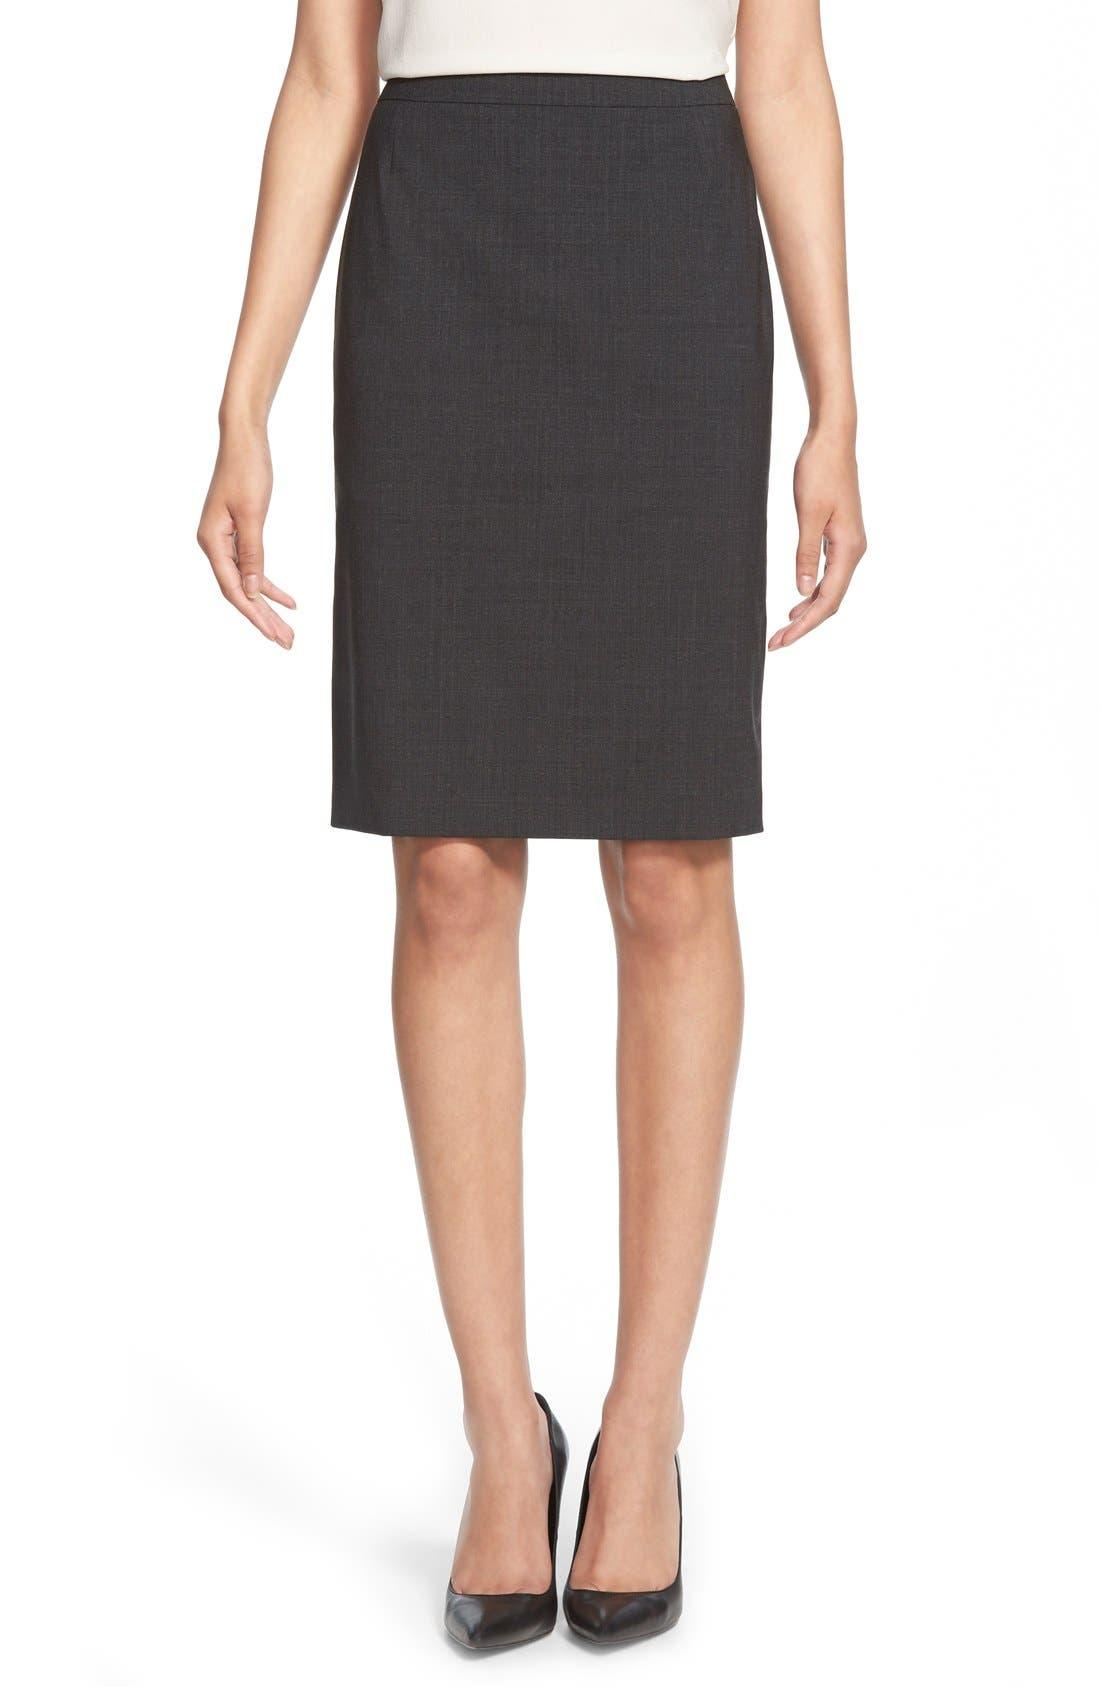 Alternate Image 1 Selected - BOSS Vilea Stretch Wool Pencil Skirt (Regular & Petite)